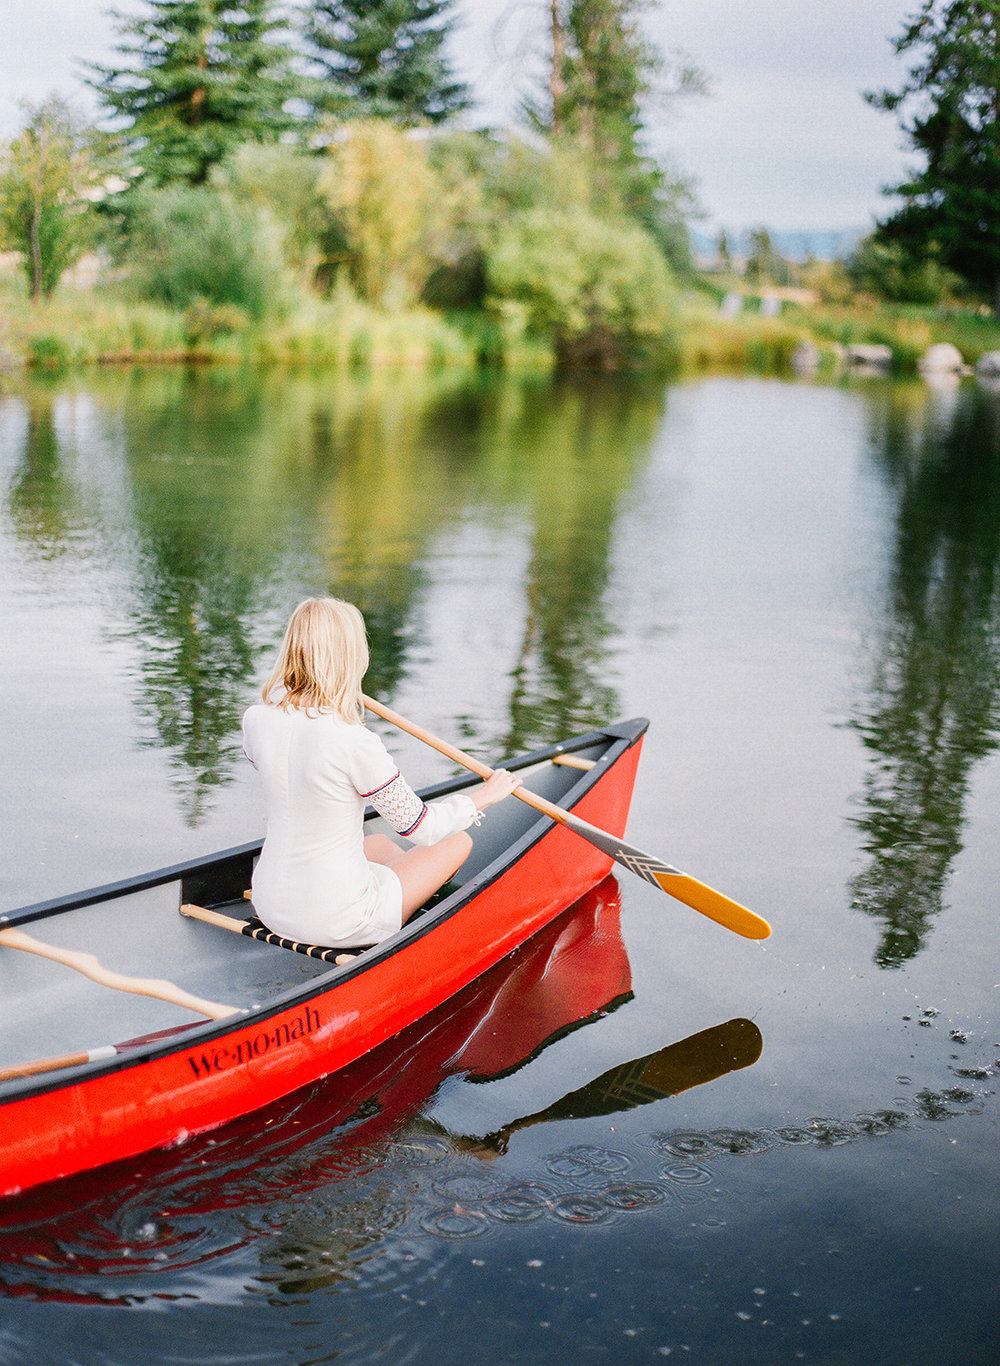 wenonah-canoe-4.jpg